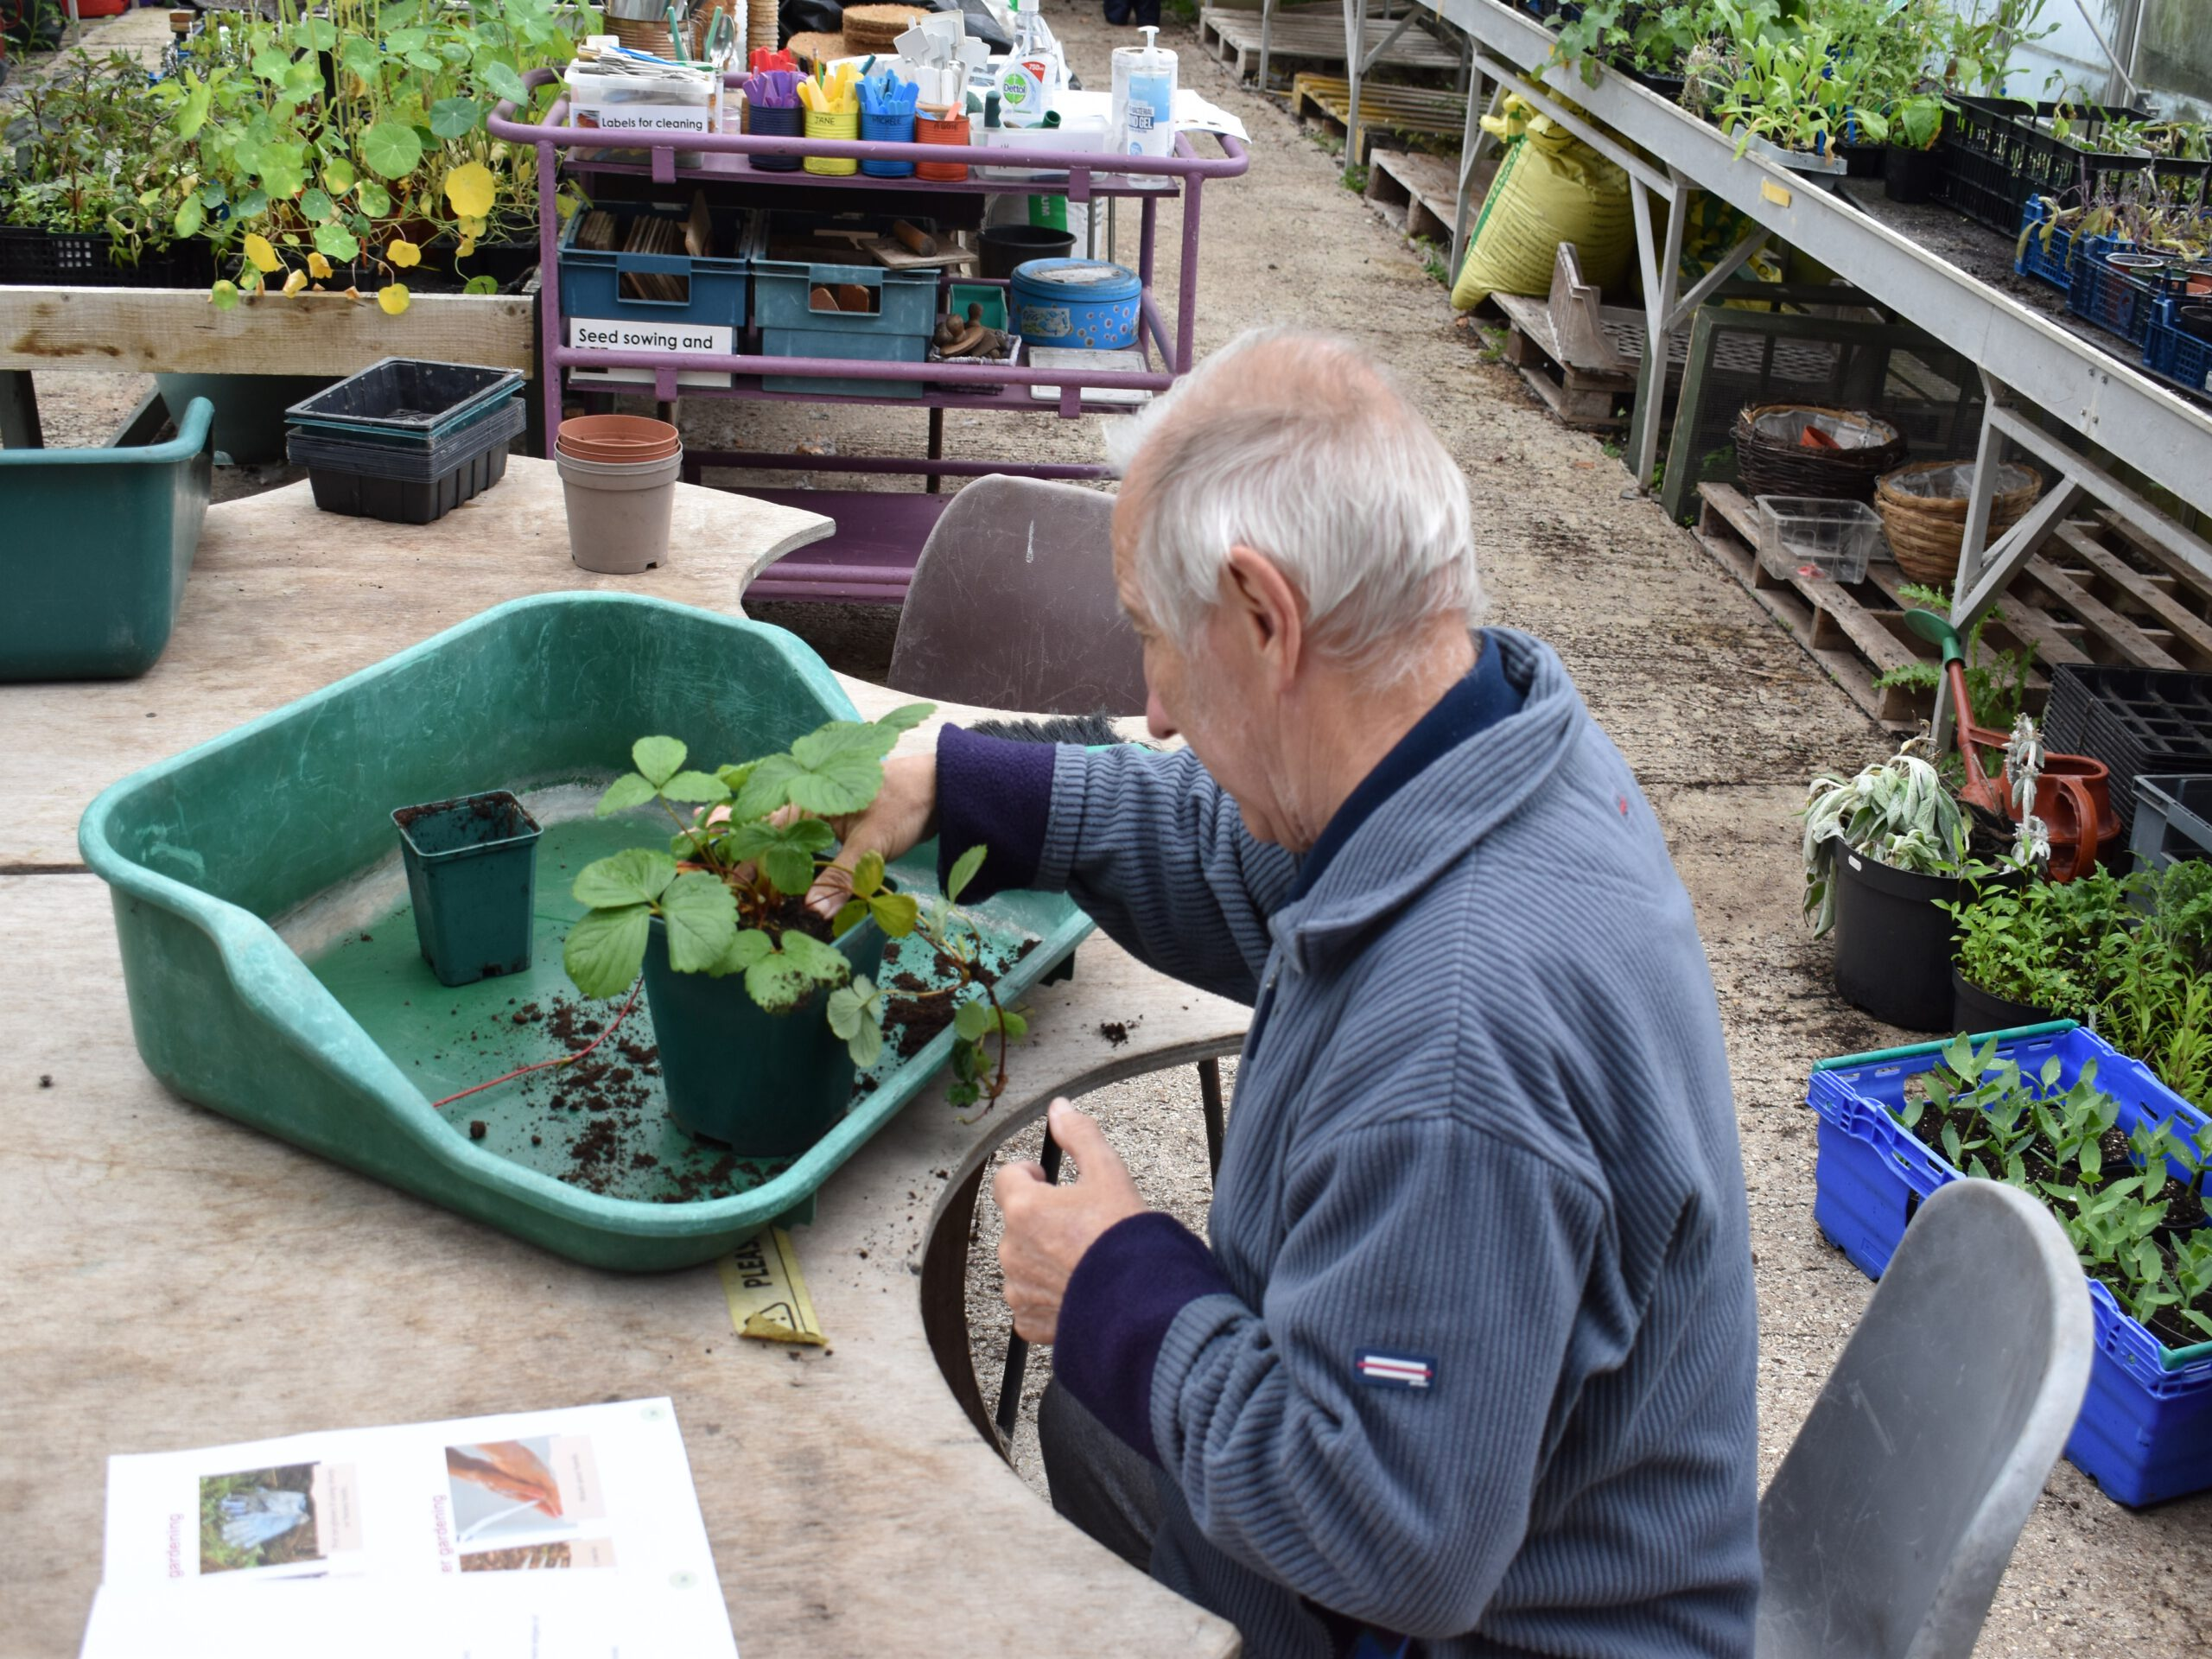 Robert gardening 44